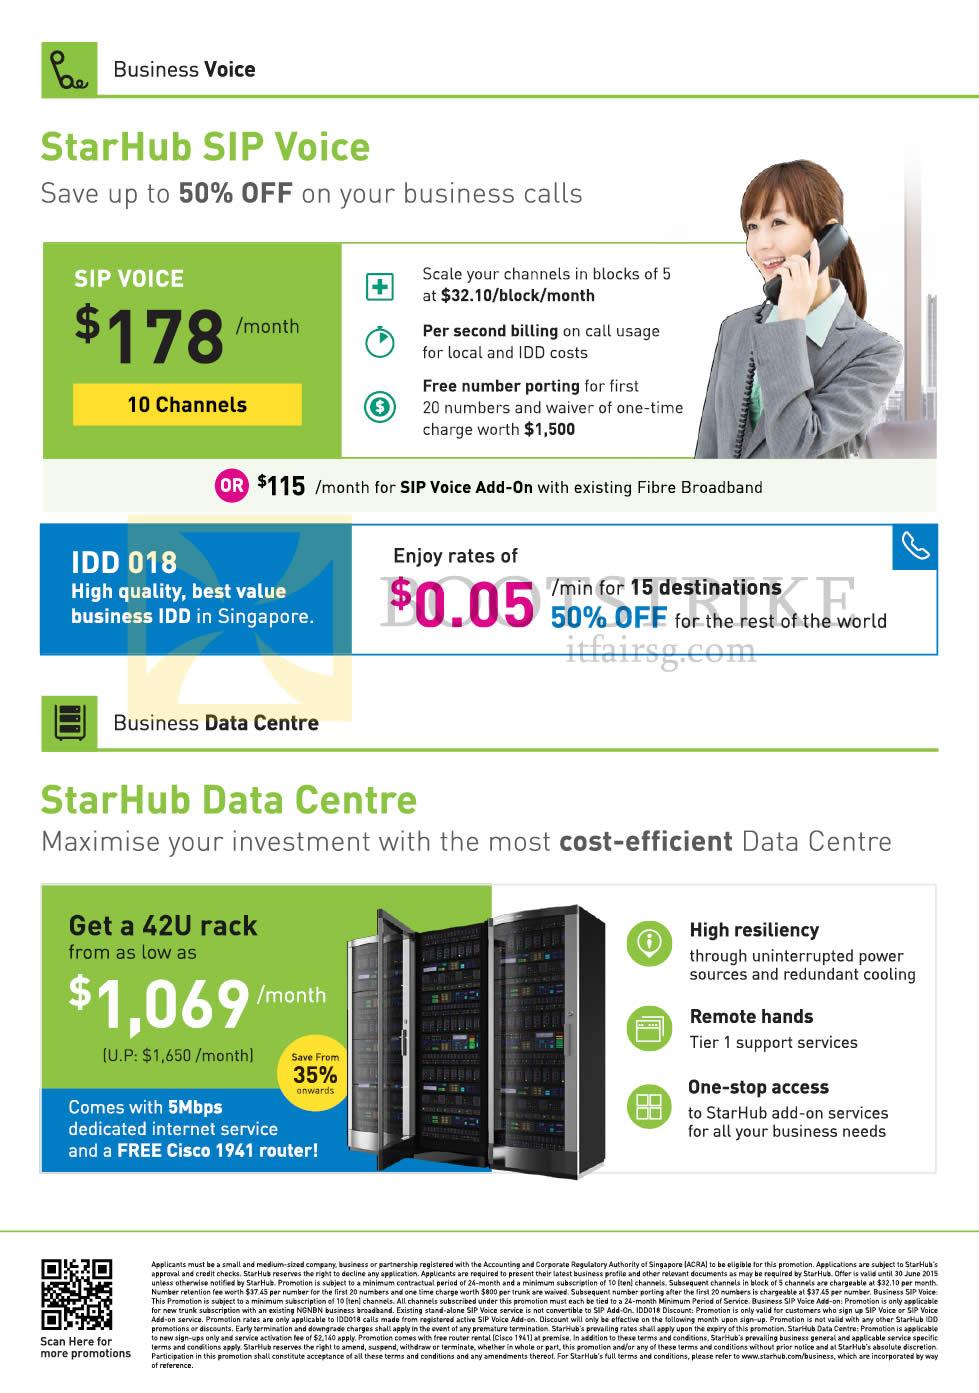 PC SHOW 2015 price list image brochure of Starhub Business SIP Voice, Data Centre